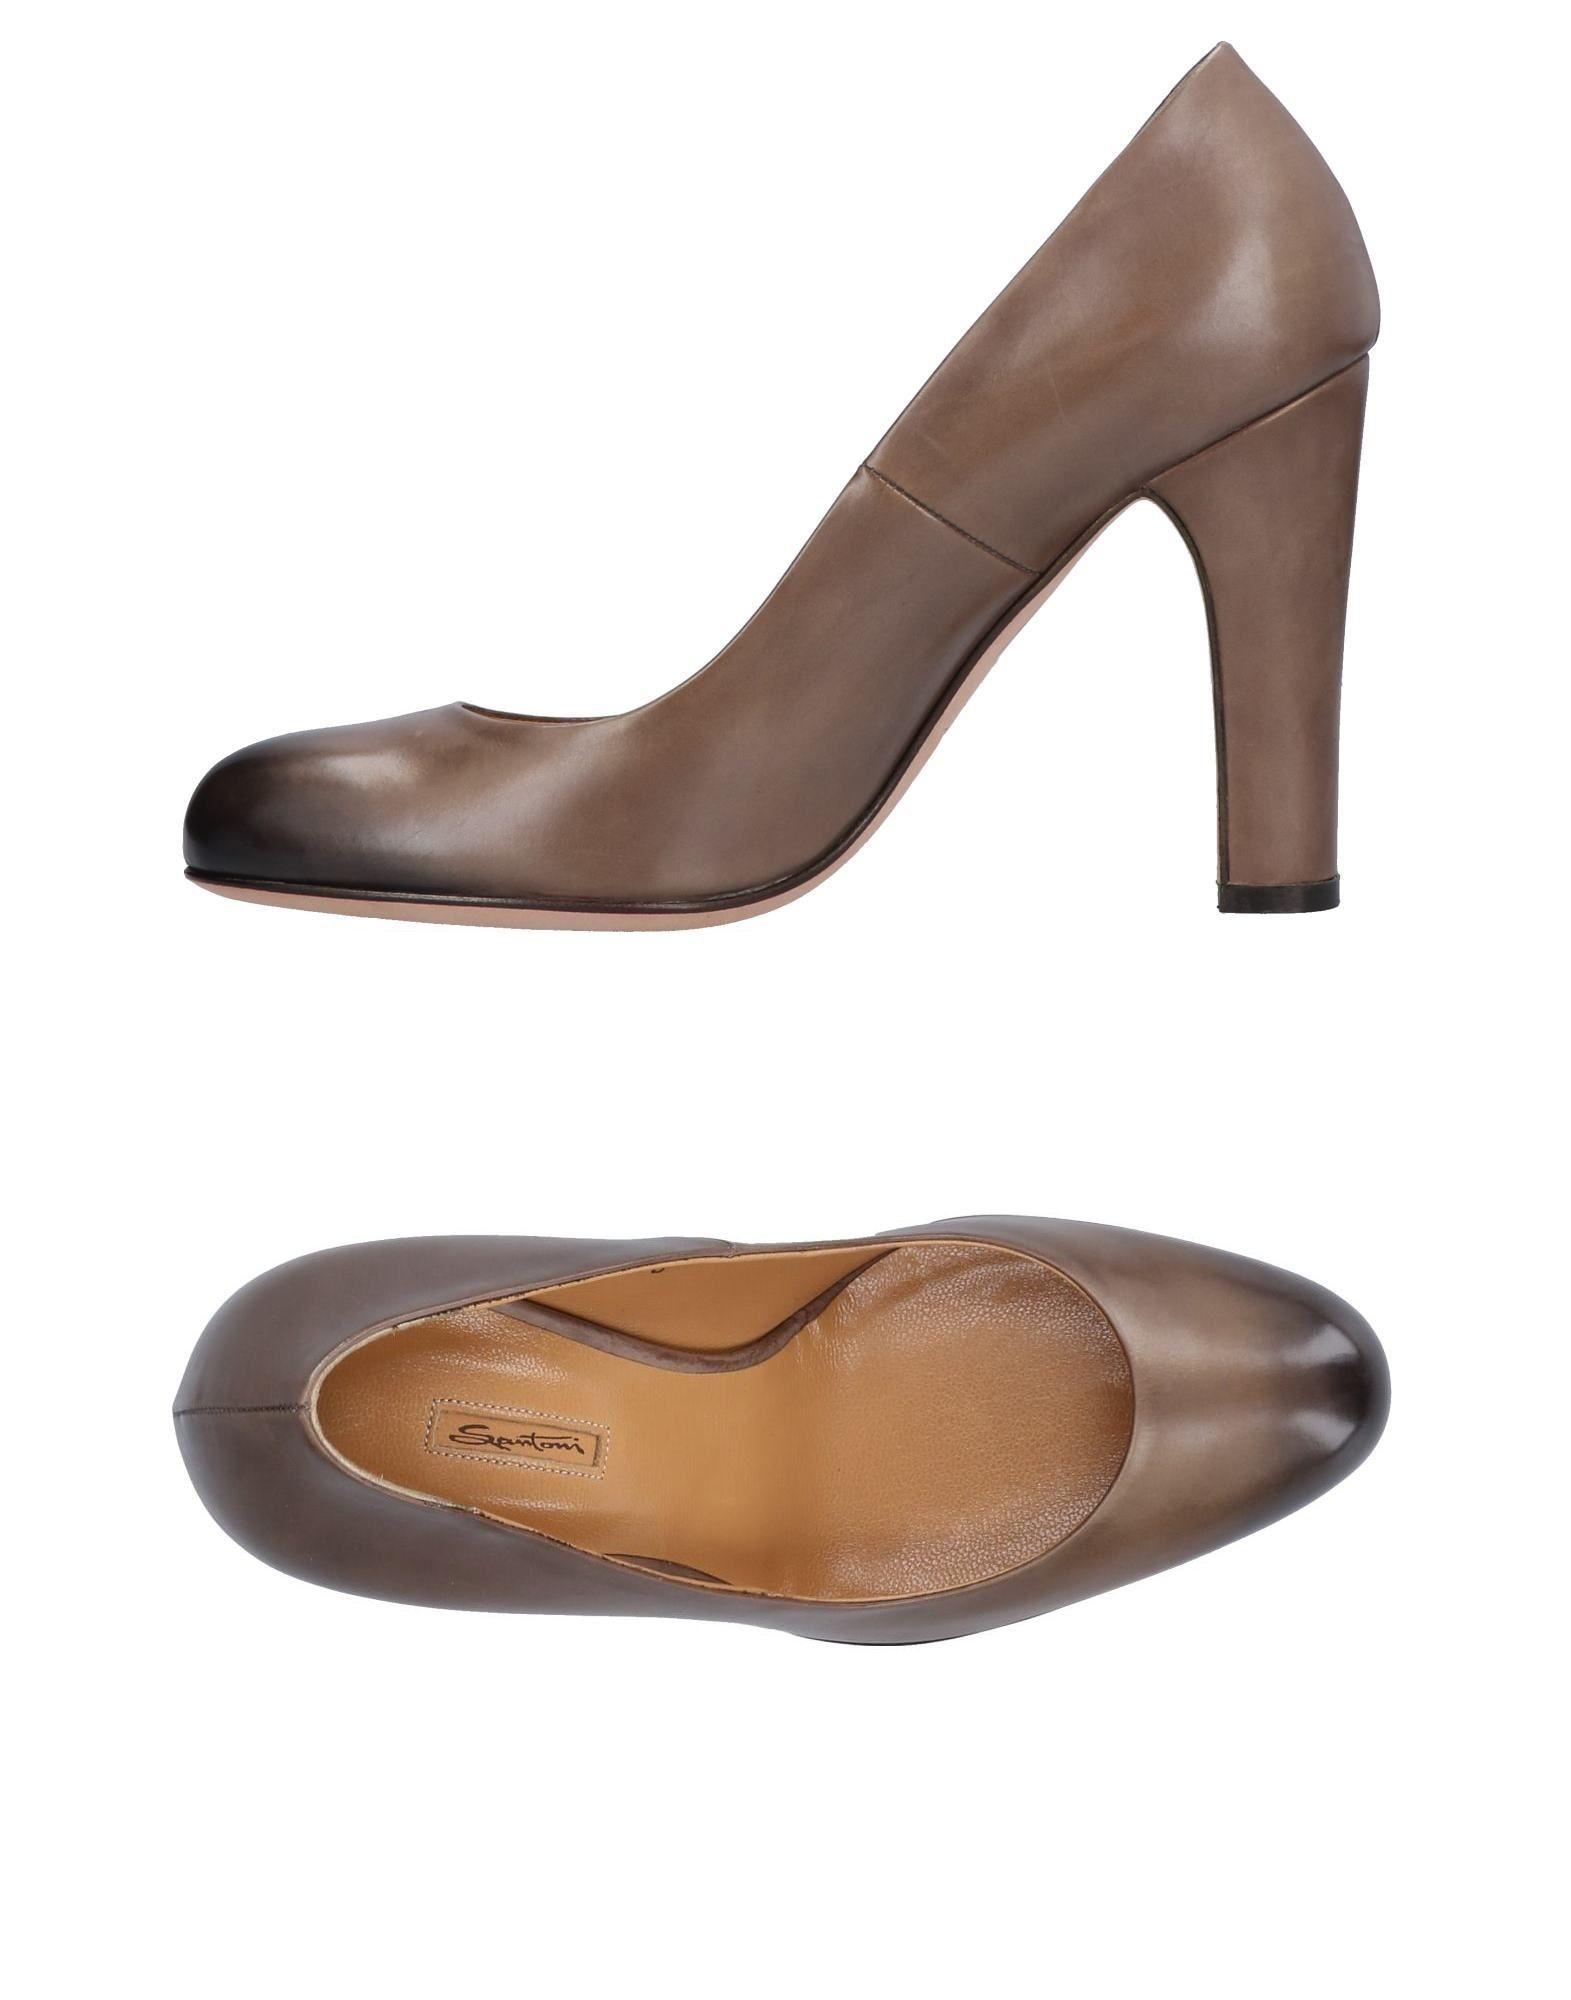 Santoni Pumps Damen  11513762IOGut aussehende strapazierfähige Schuhe